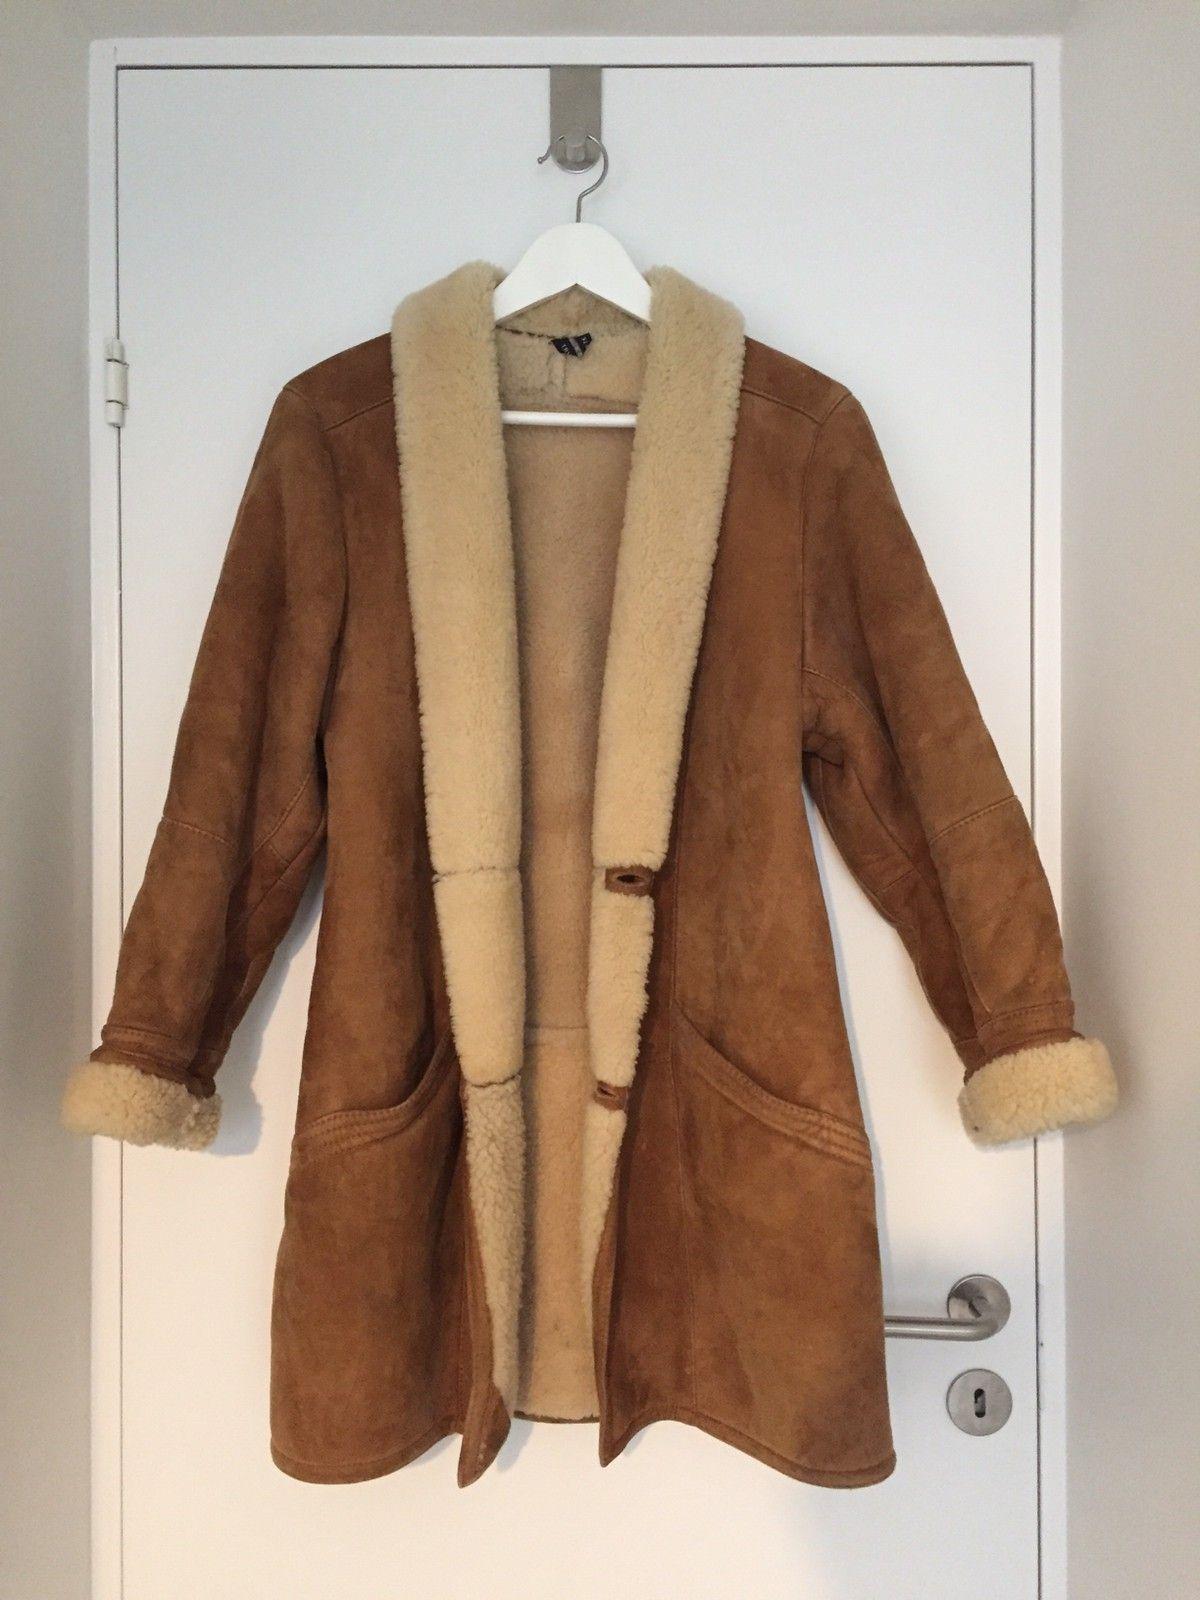 Vintage jakke i saueskinn | FINN.no